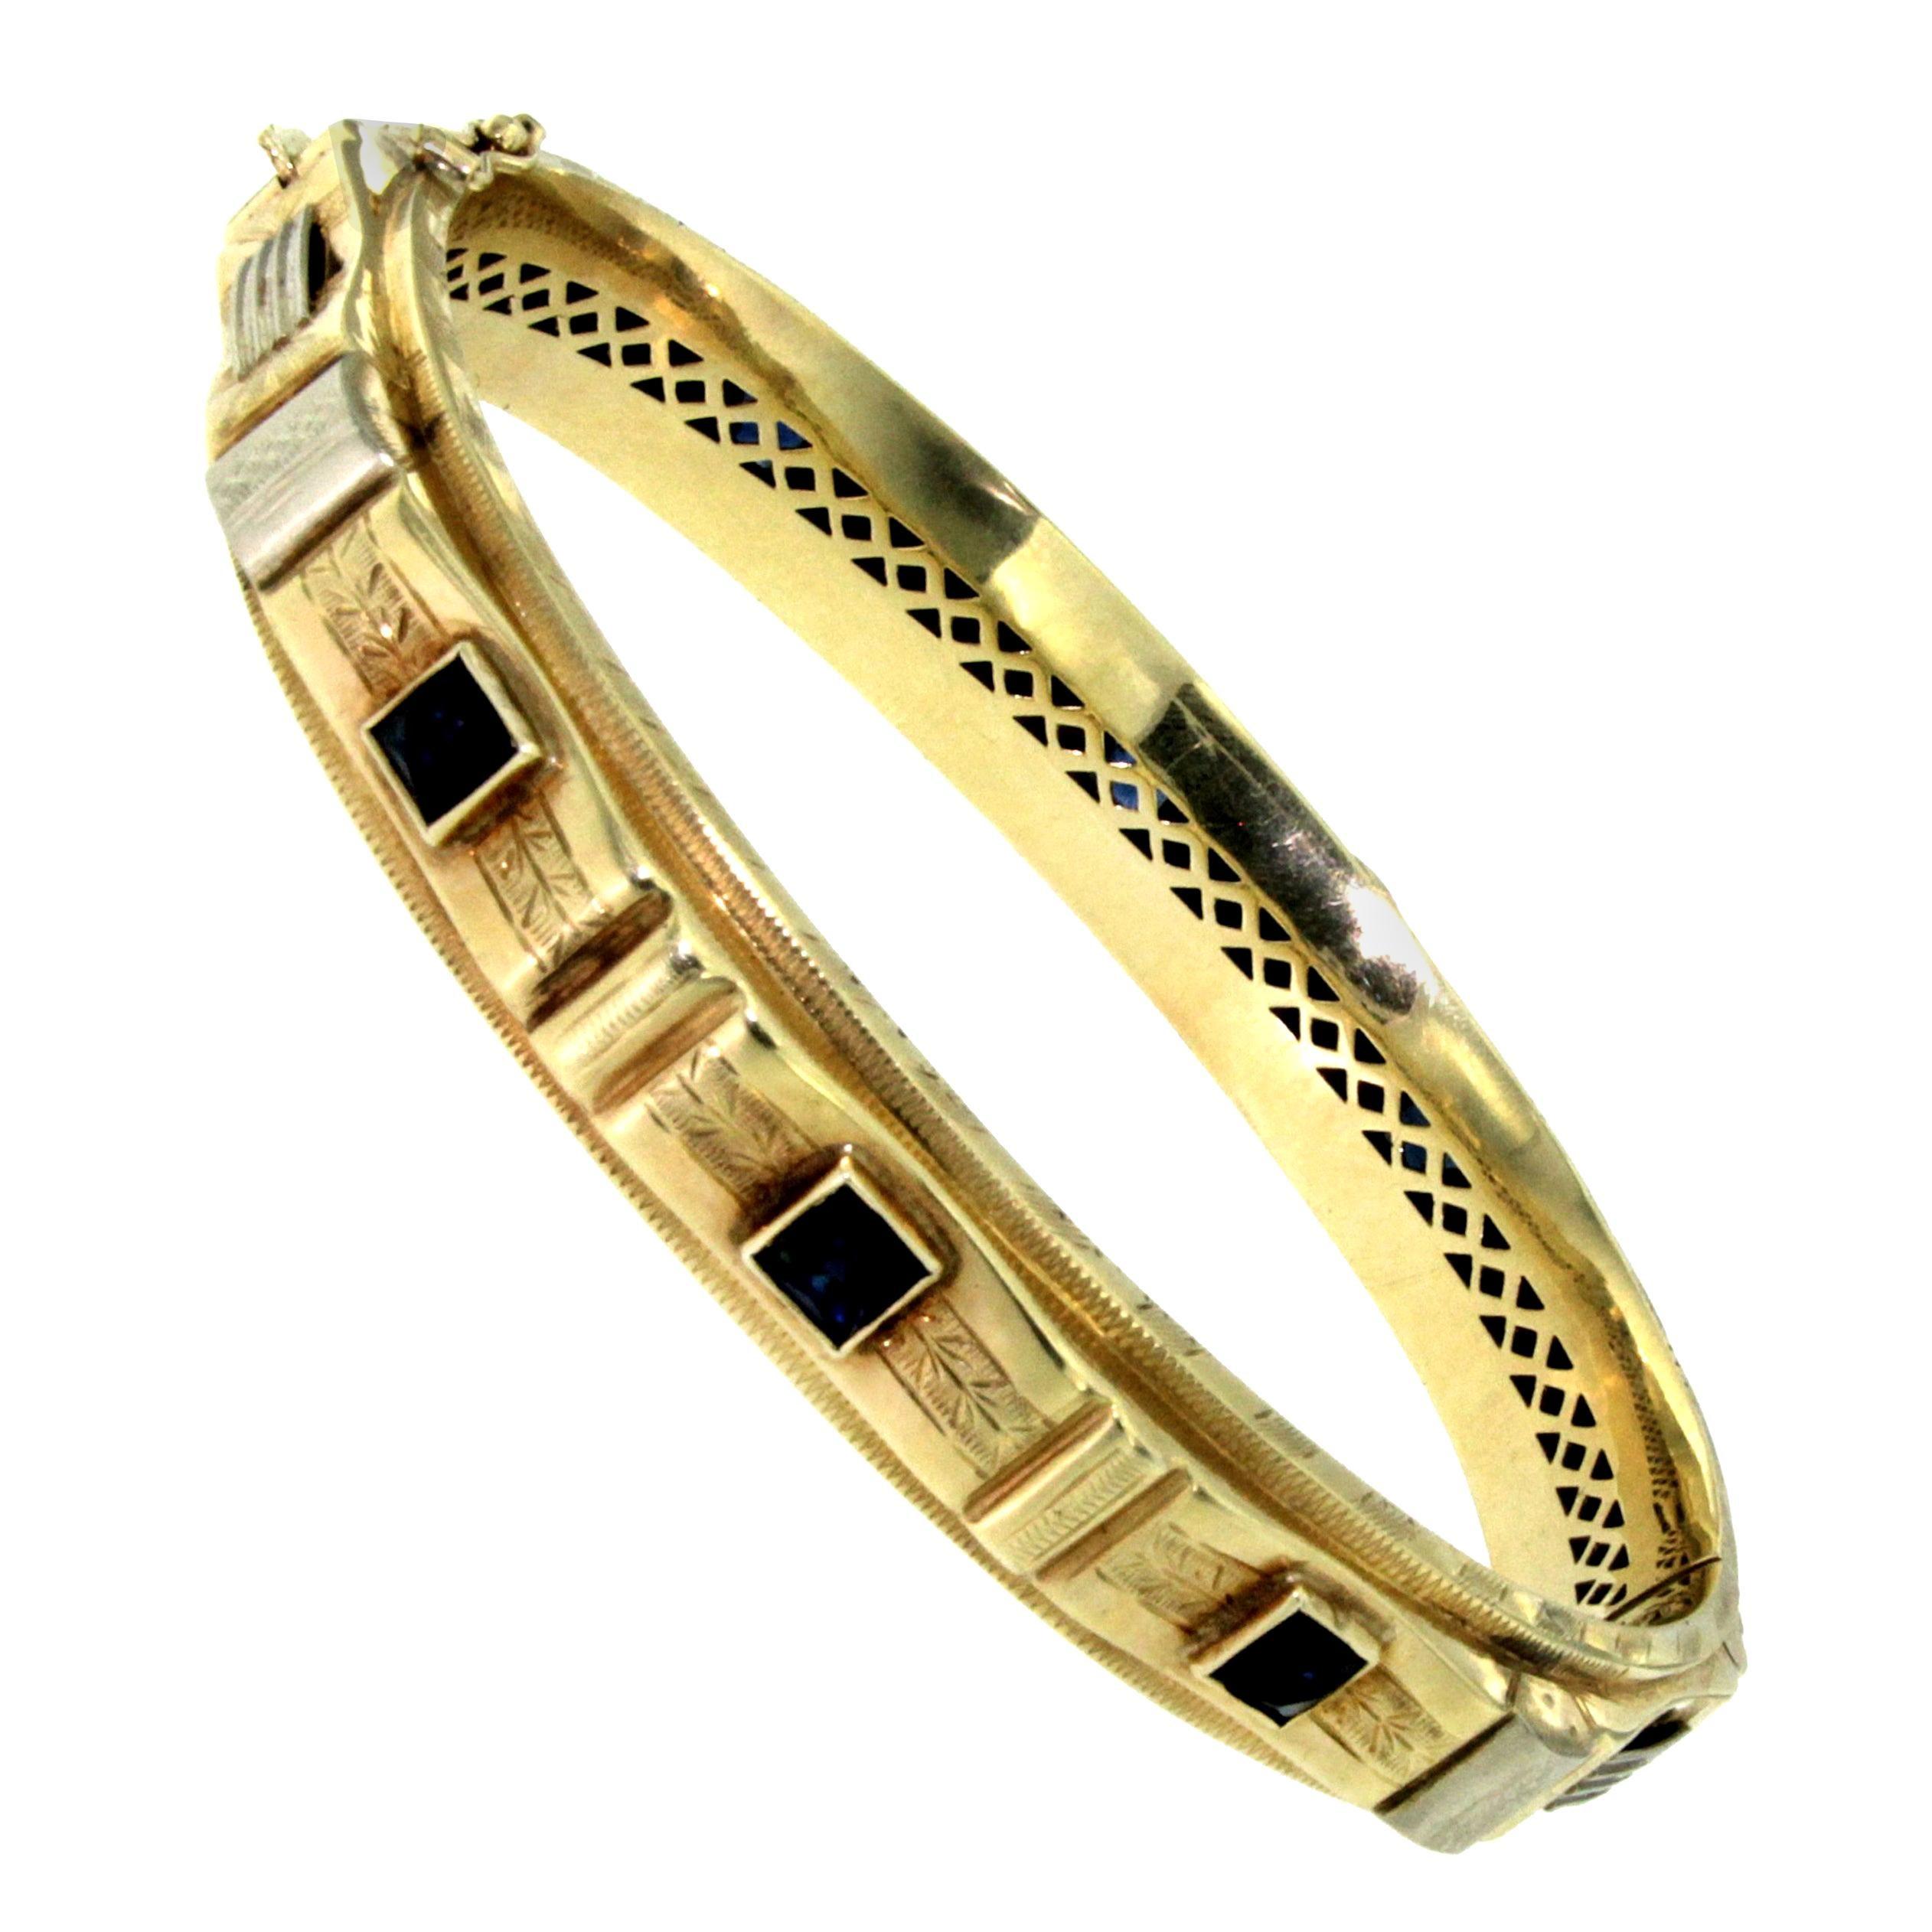 1930s Fasces Lictorii Gold Bangle Bracelet